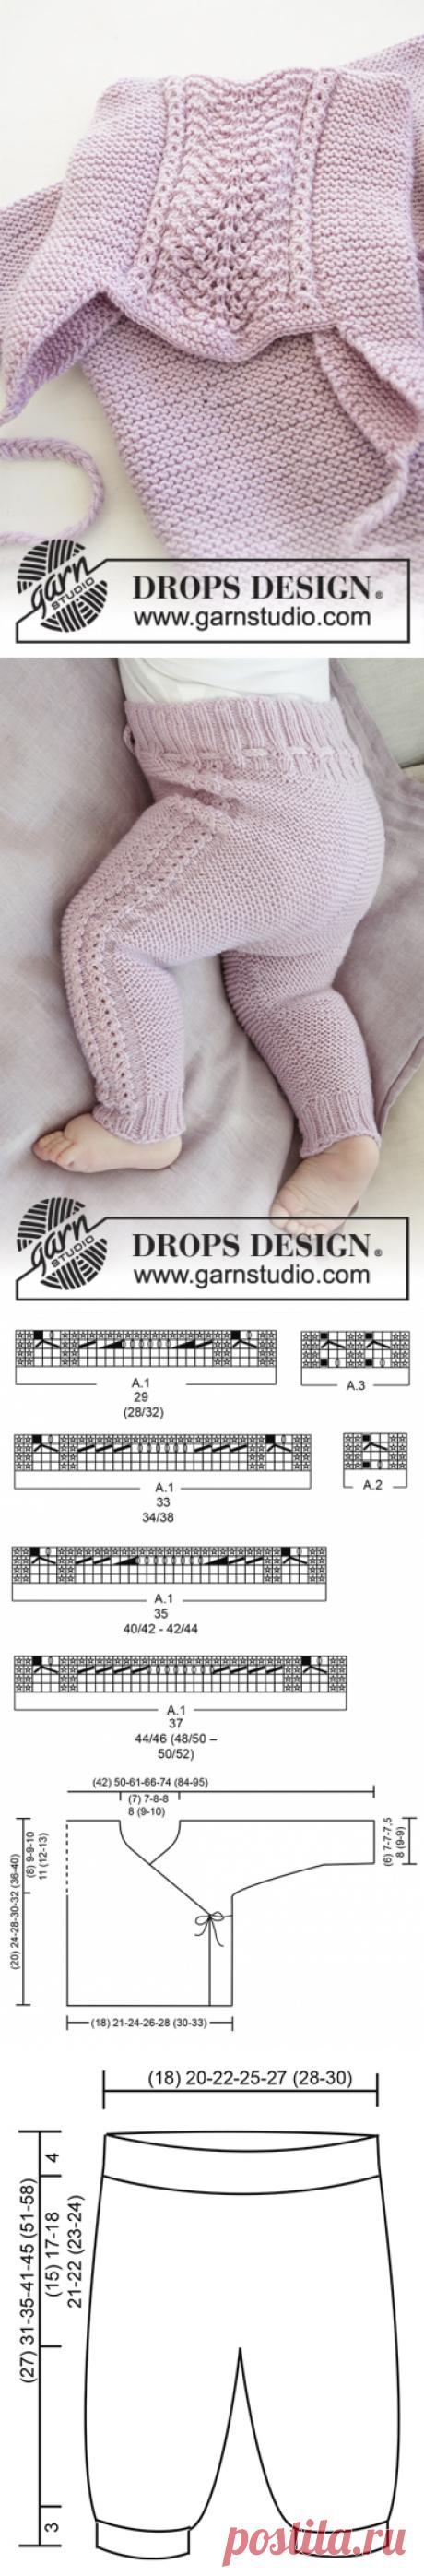 Комплект из кофточки, штанишек и шапочки Hello Kitten - блог экспертов интернет-магазина пряжи 5motkov.ru